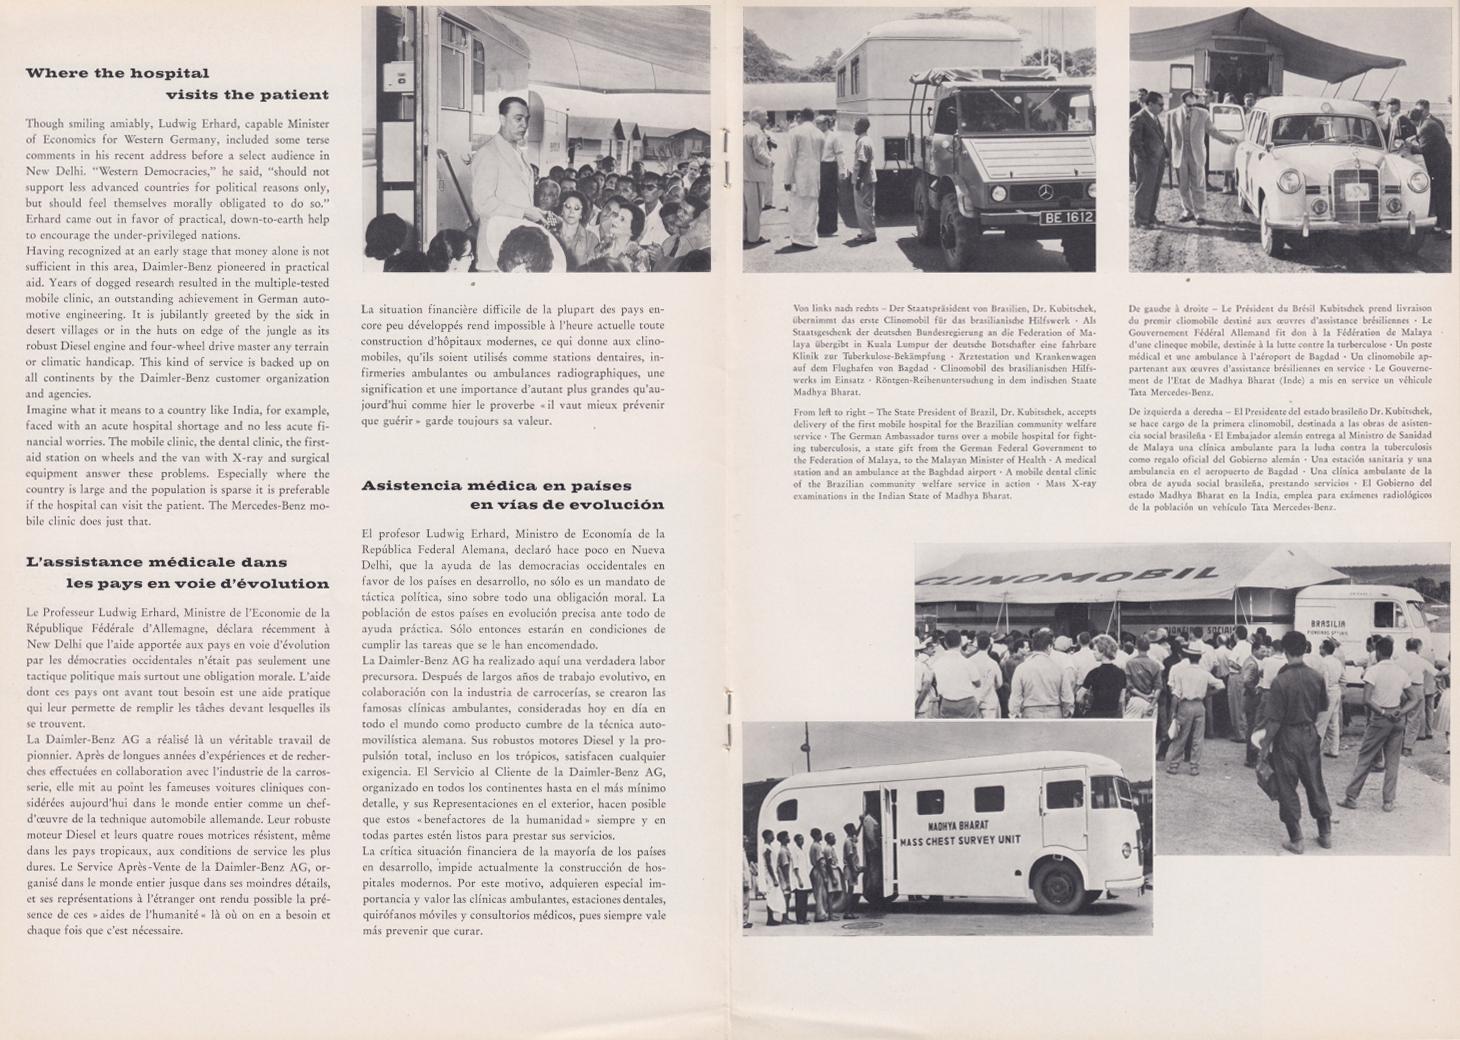 (REVISTA): Periódico In aller welt n.º 29 - Mercedes-Benz no mundo - 1959 - multilingue 007